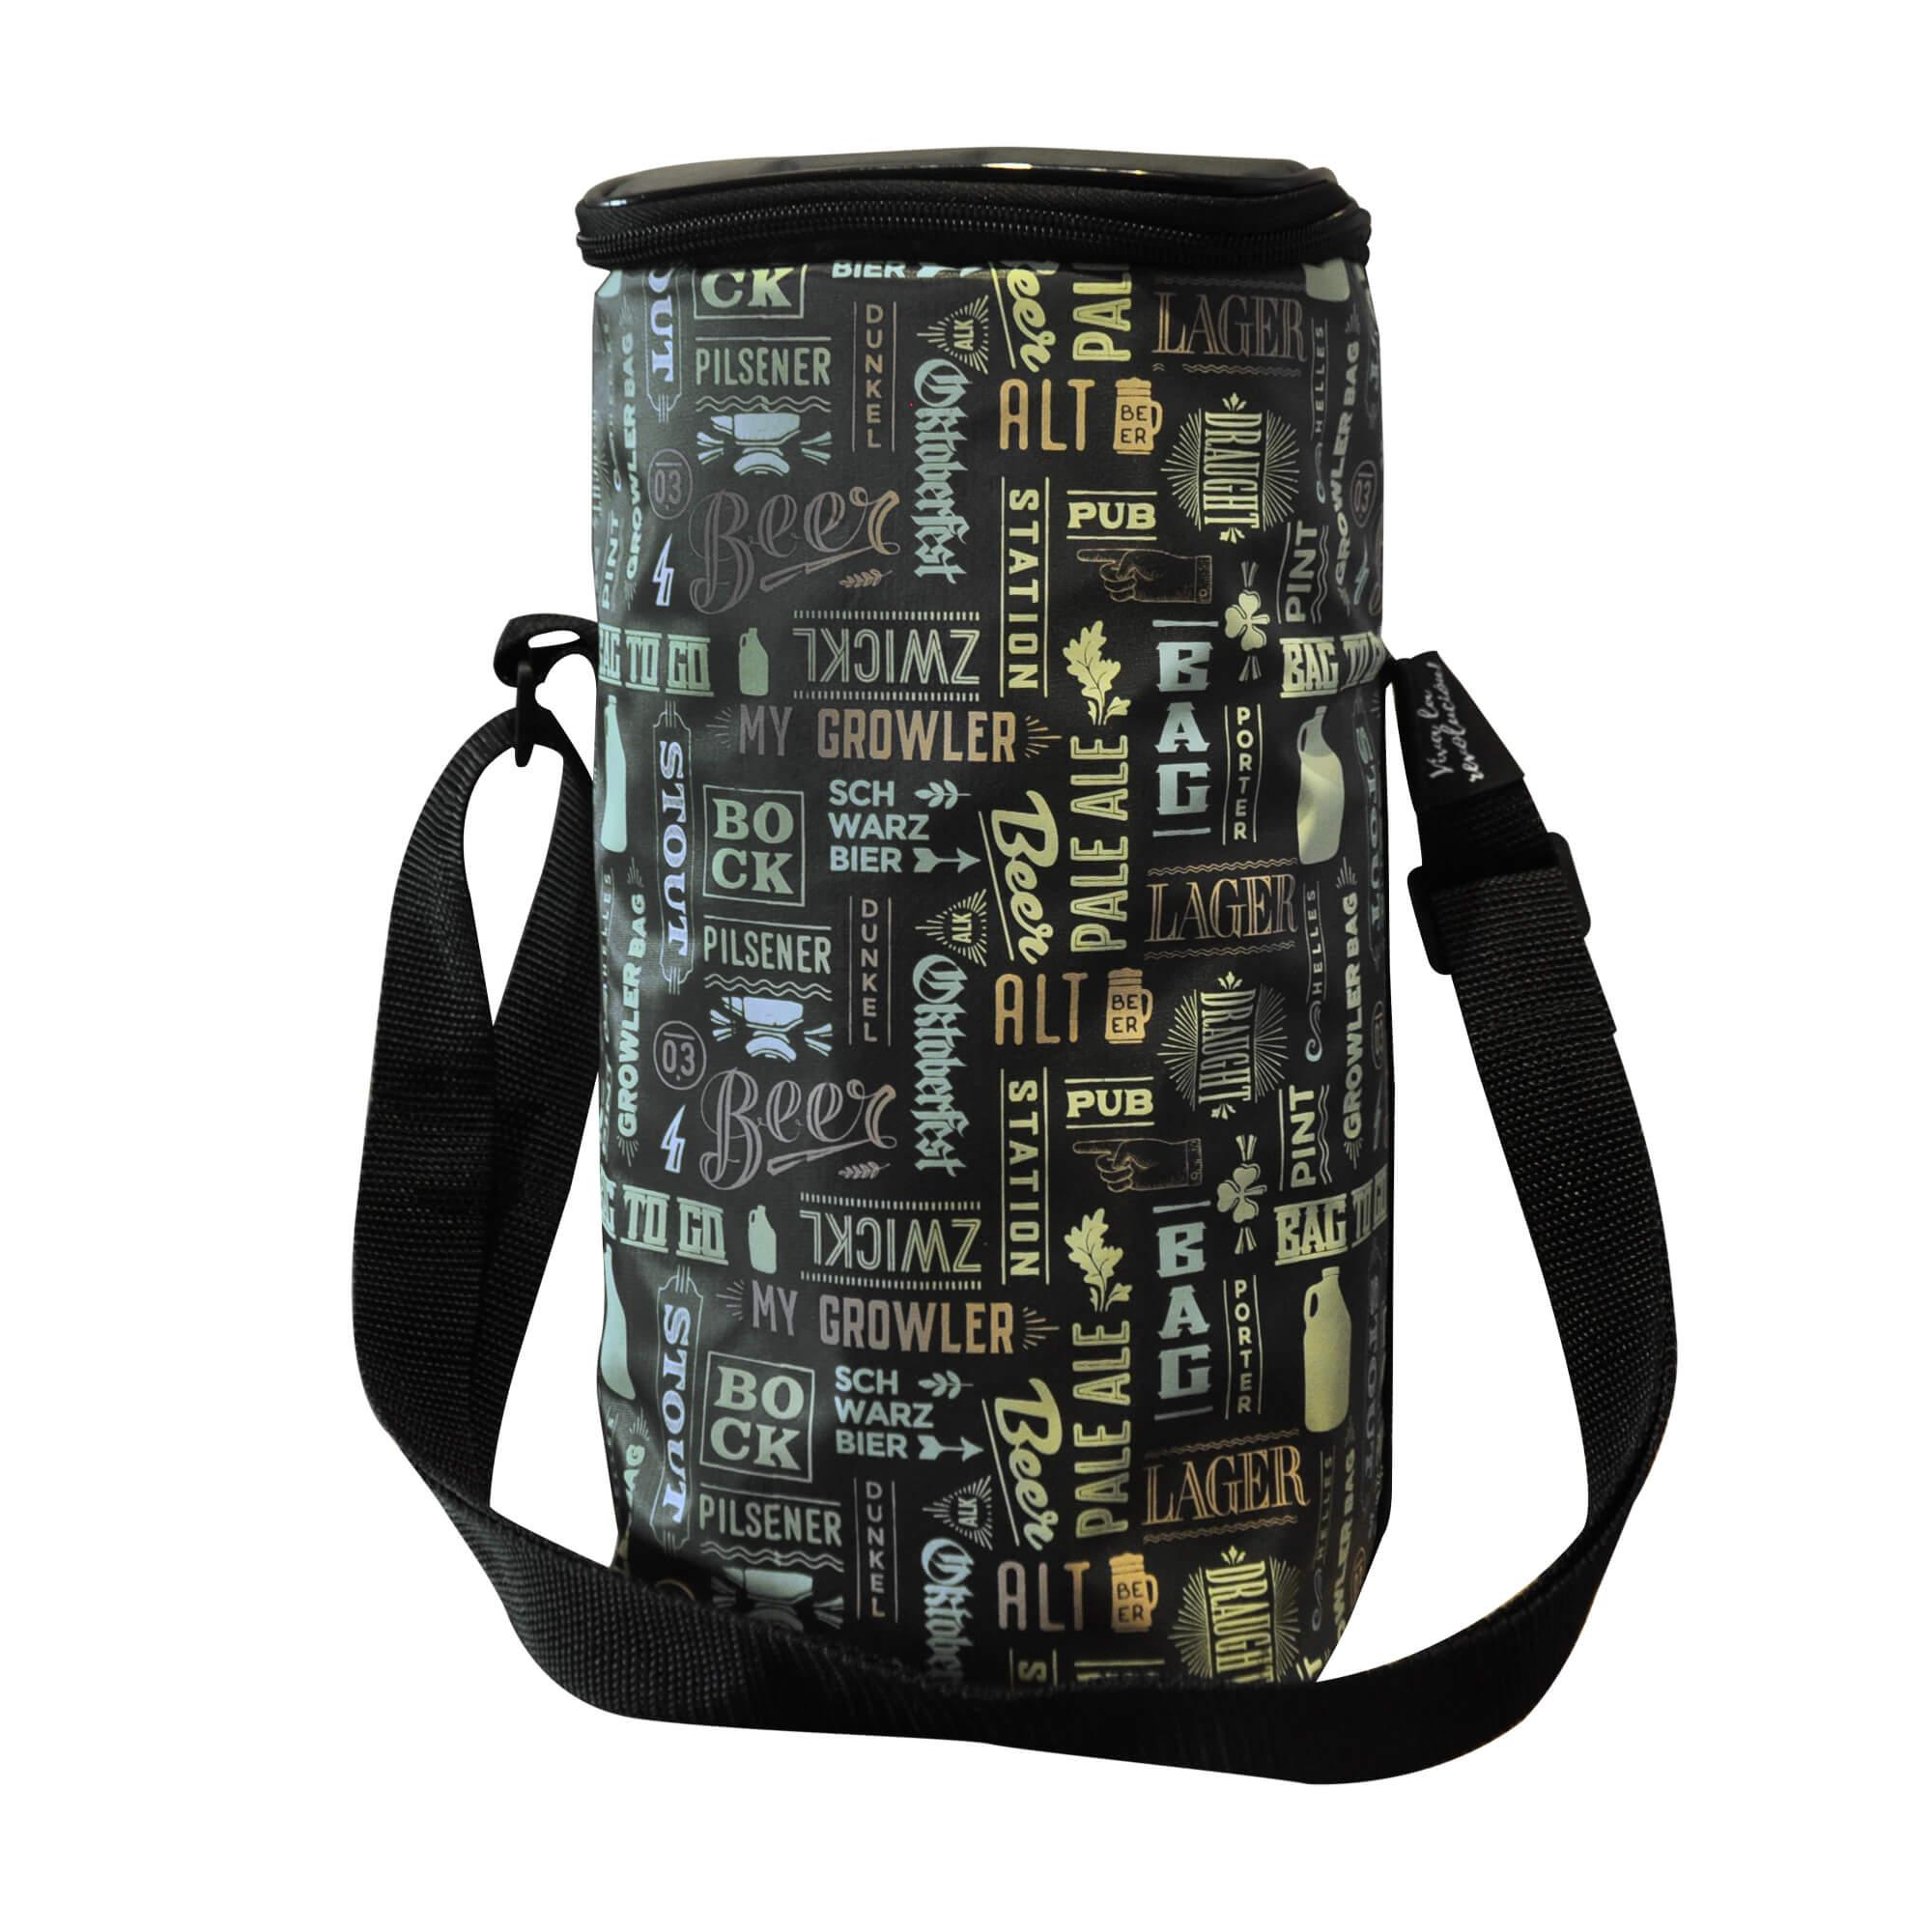 Kit My Keg #3 - Mini Keg, Mini Barril 3,8L My Growler + Growler Bag To Go para 1 growler